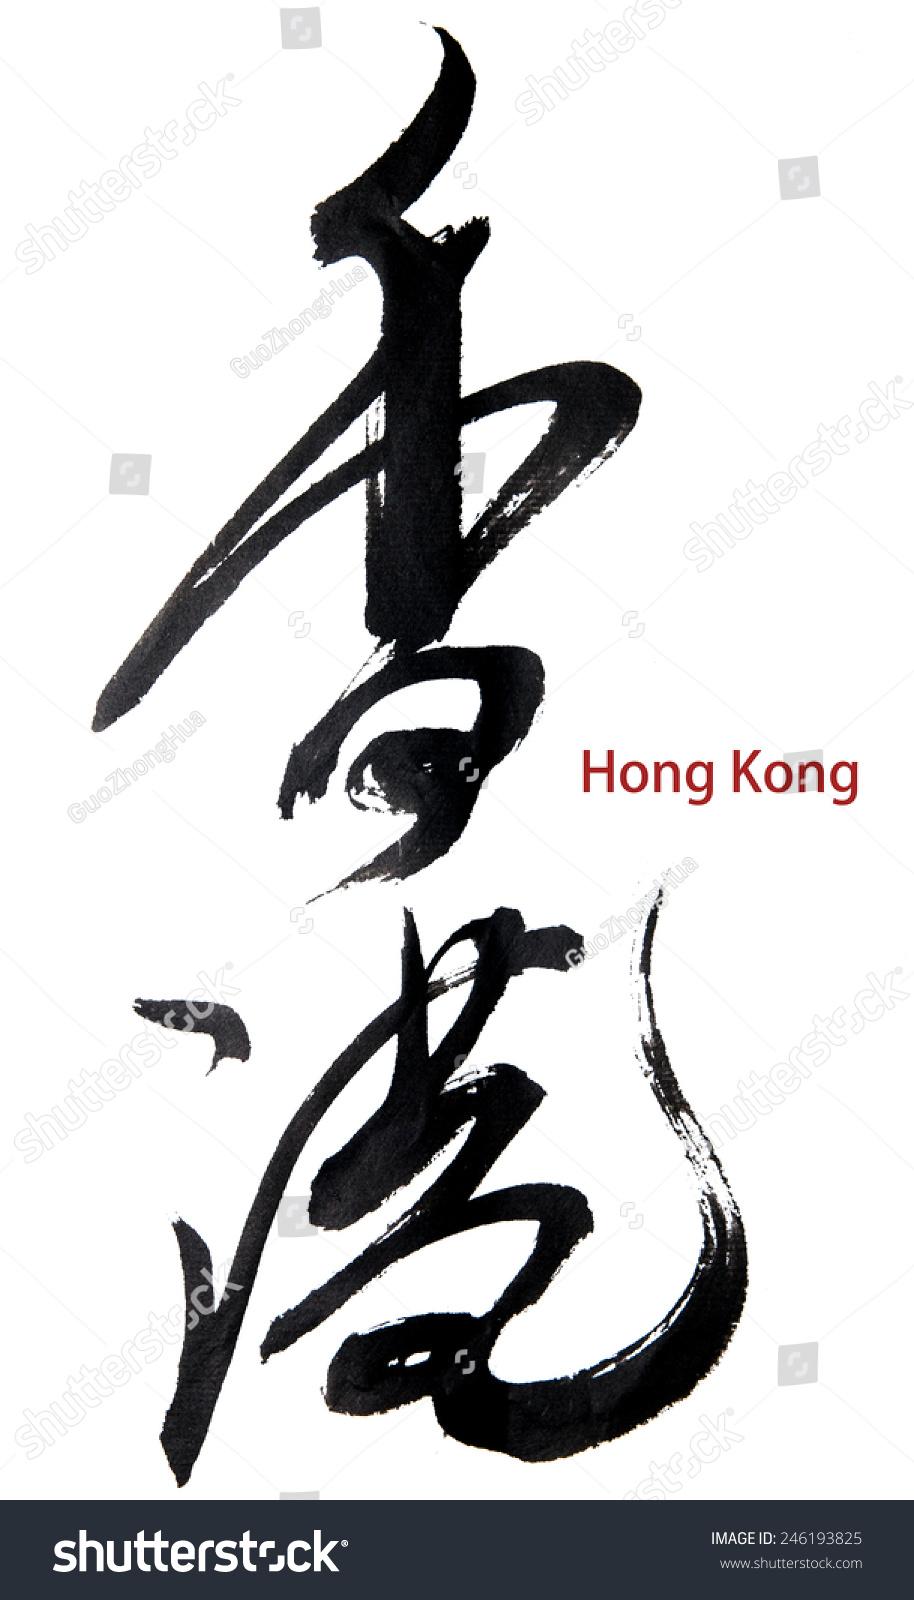 Traditional chinese calligraphy hong kongthis city stock traditional chinese calligraphy for hong kongthis is a city name in chinese biocorpaavc Choice Image